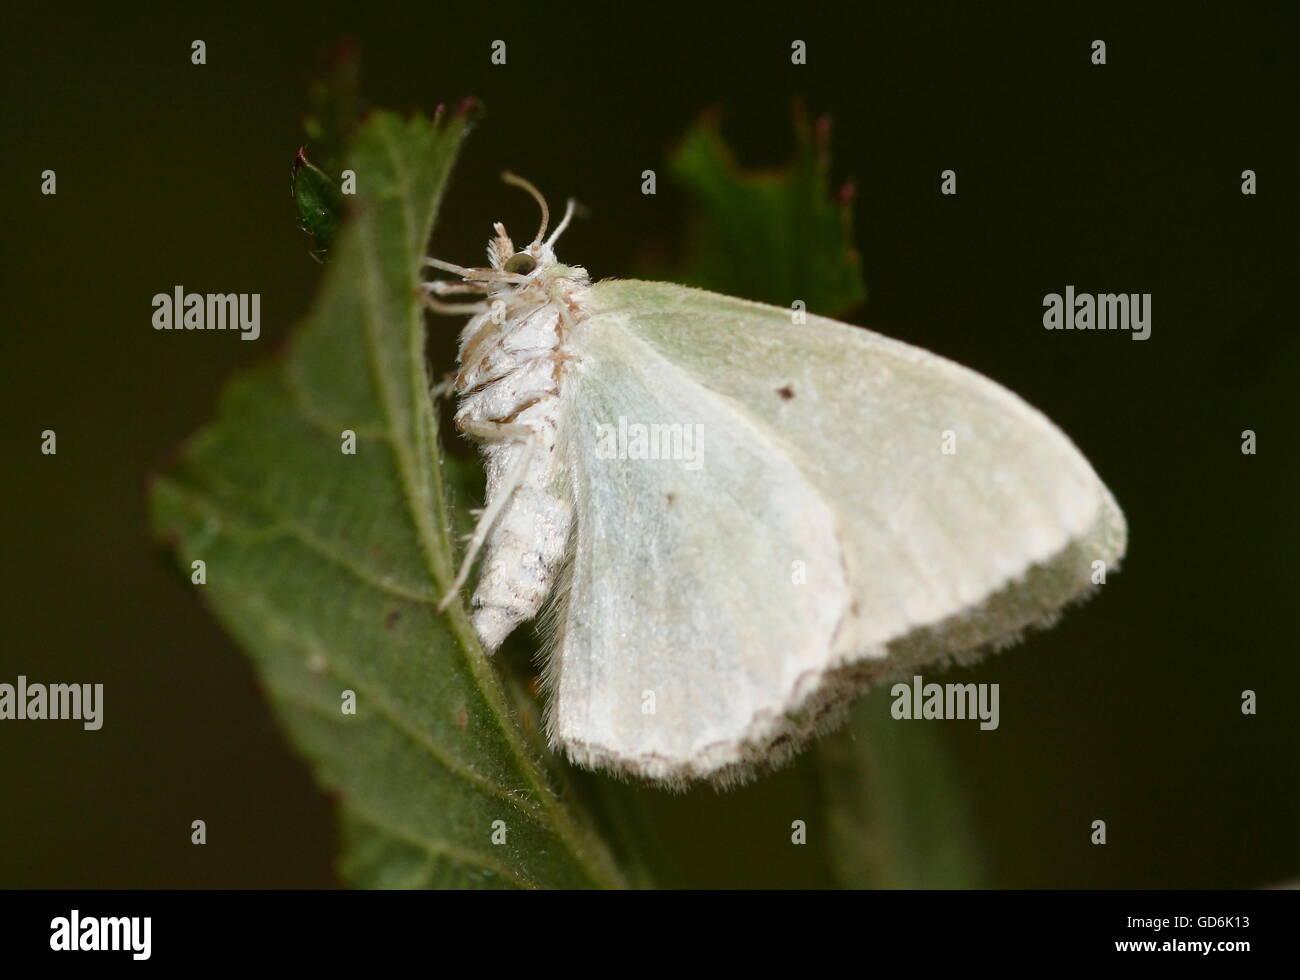 European Blotched Emerald Moth (Comibaena bajularia) - Stock Image